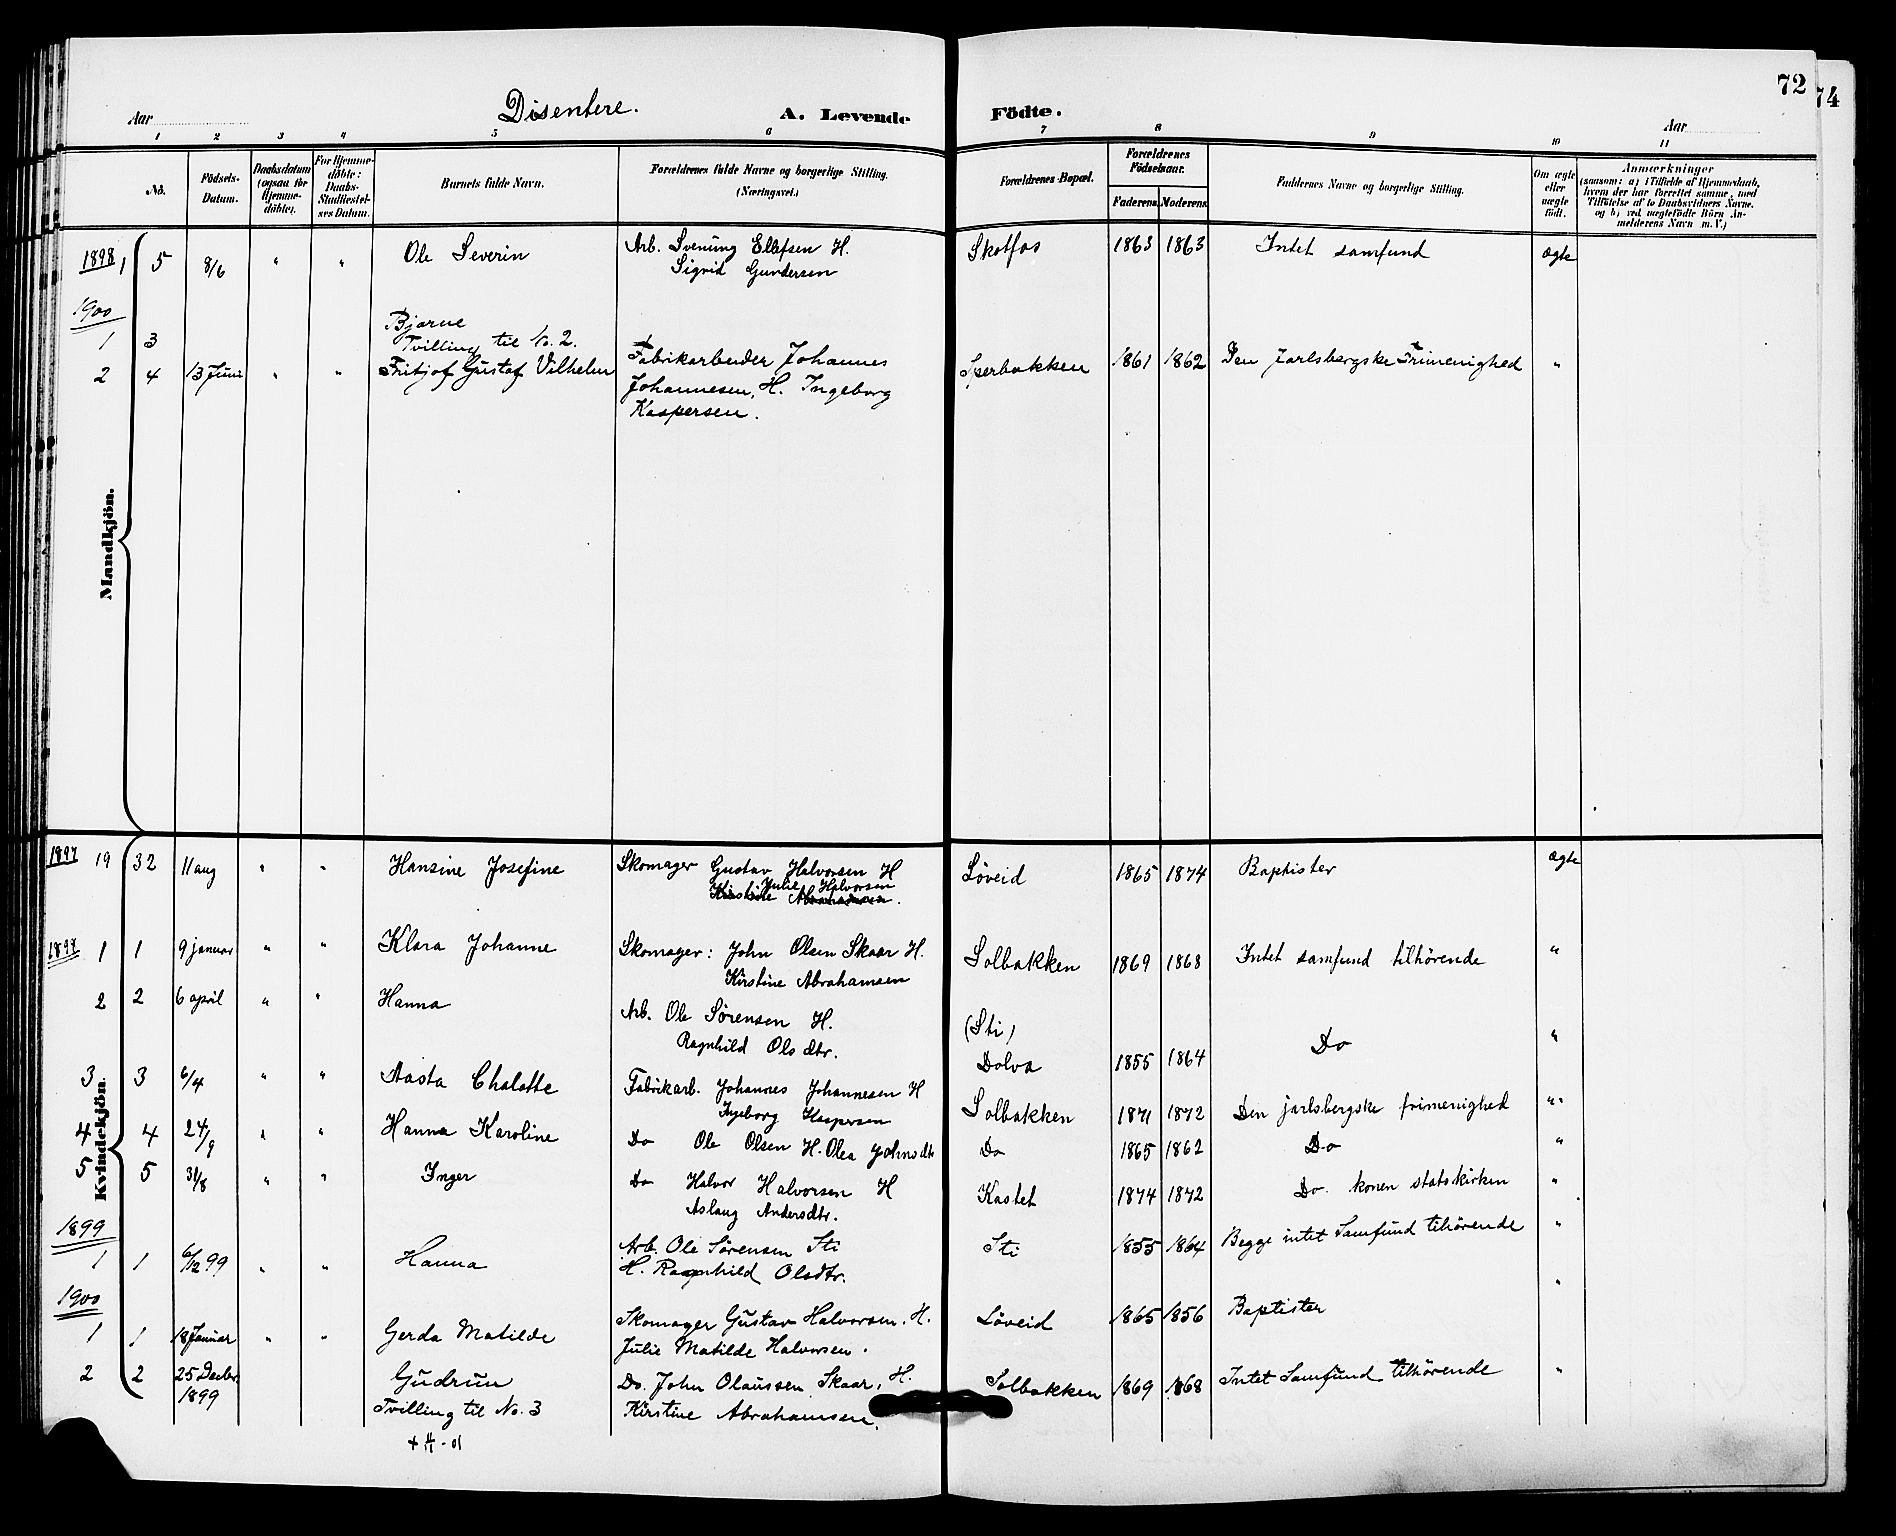 SAKO, Solum kirkebøker, G/Gb/L0004: Klokkerbok nr. II 4, 1898-1905, s. 72